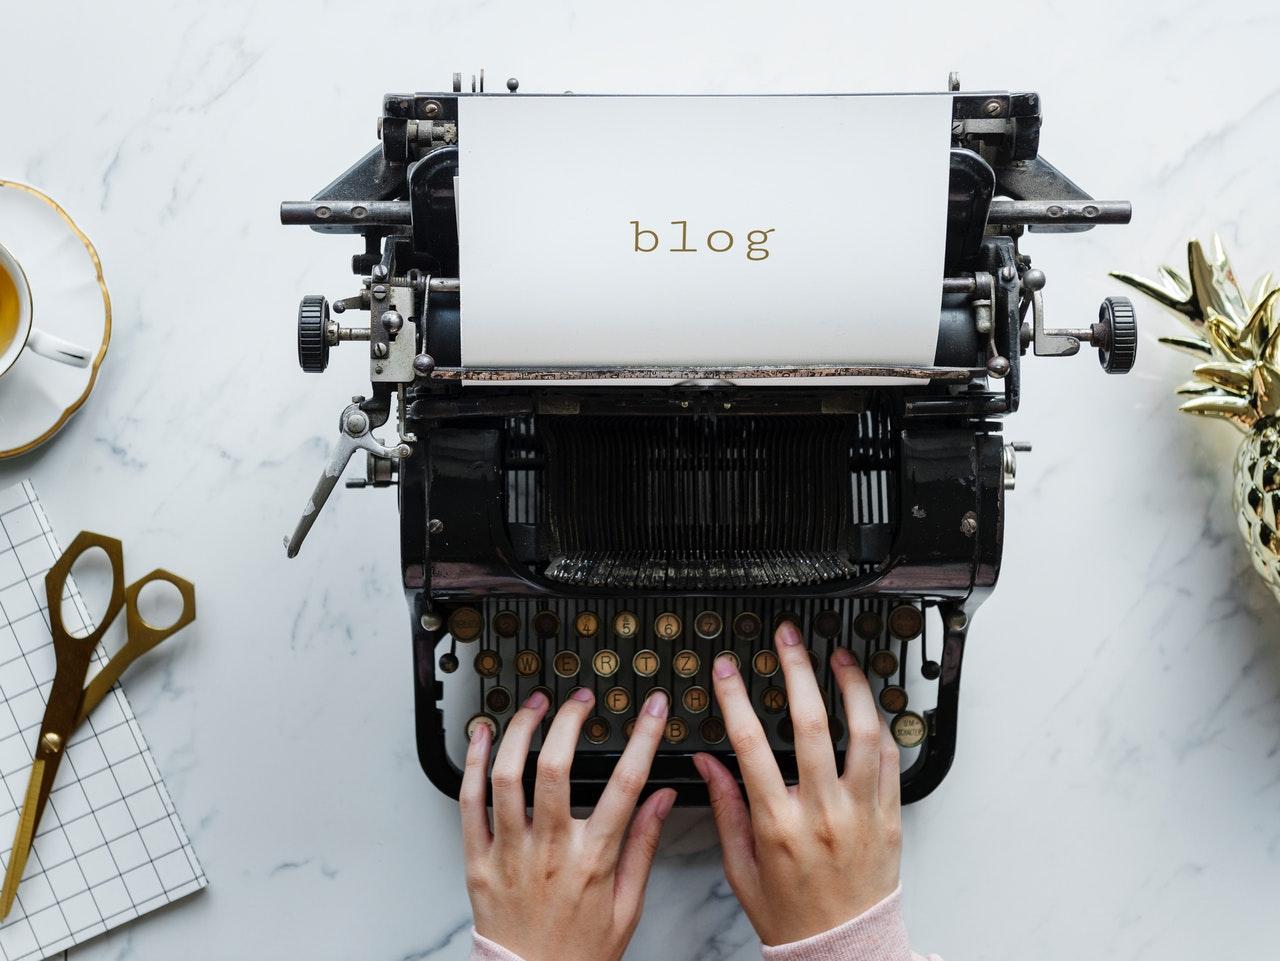 Hands typing on an antique typewriter